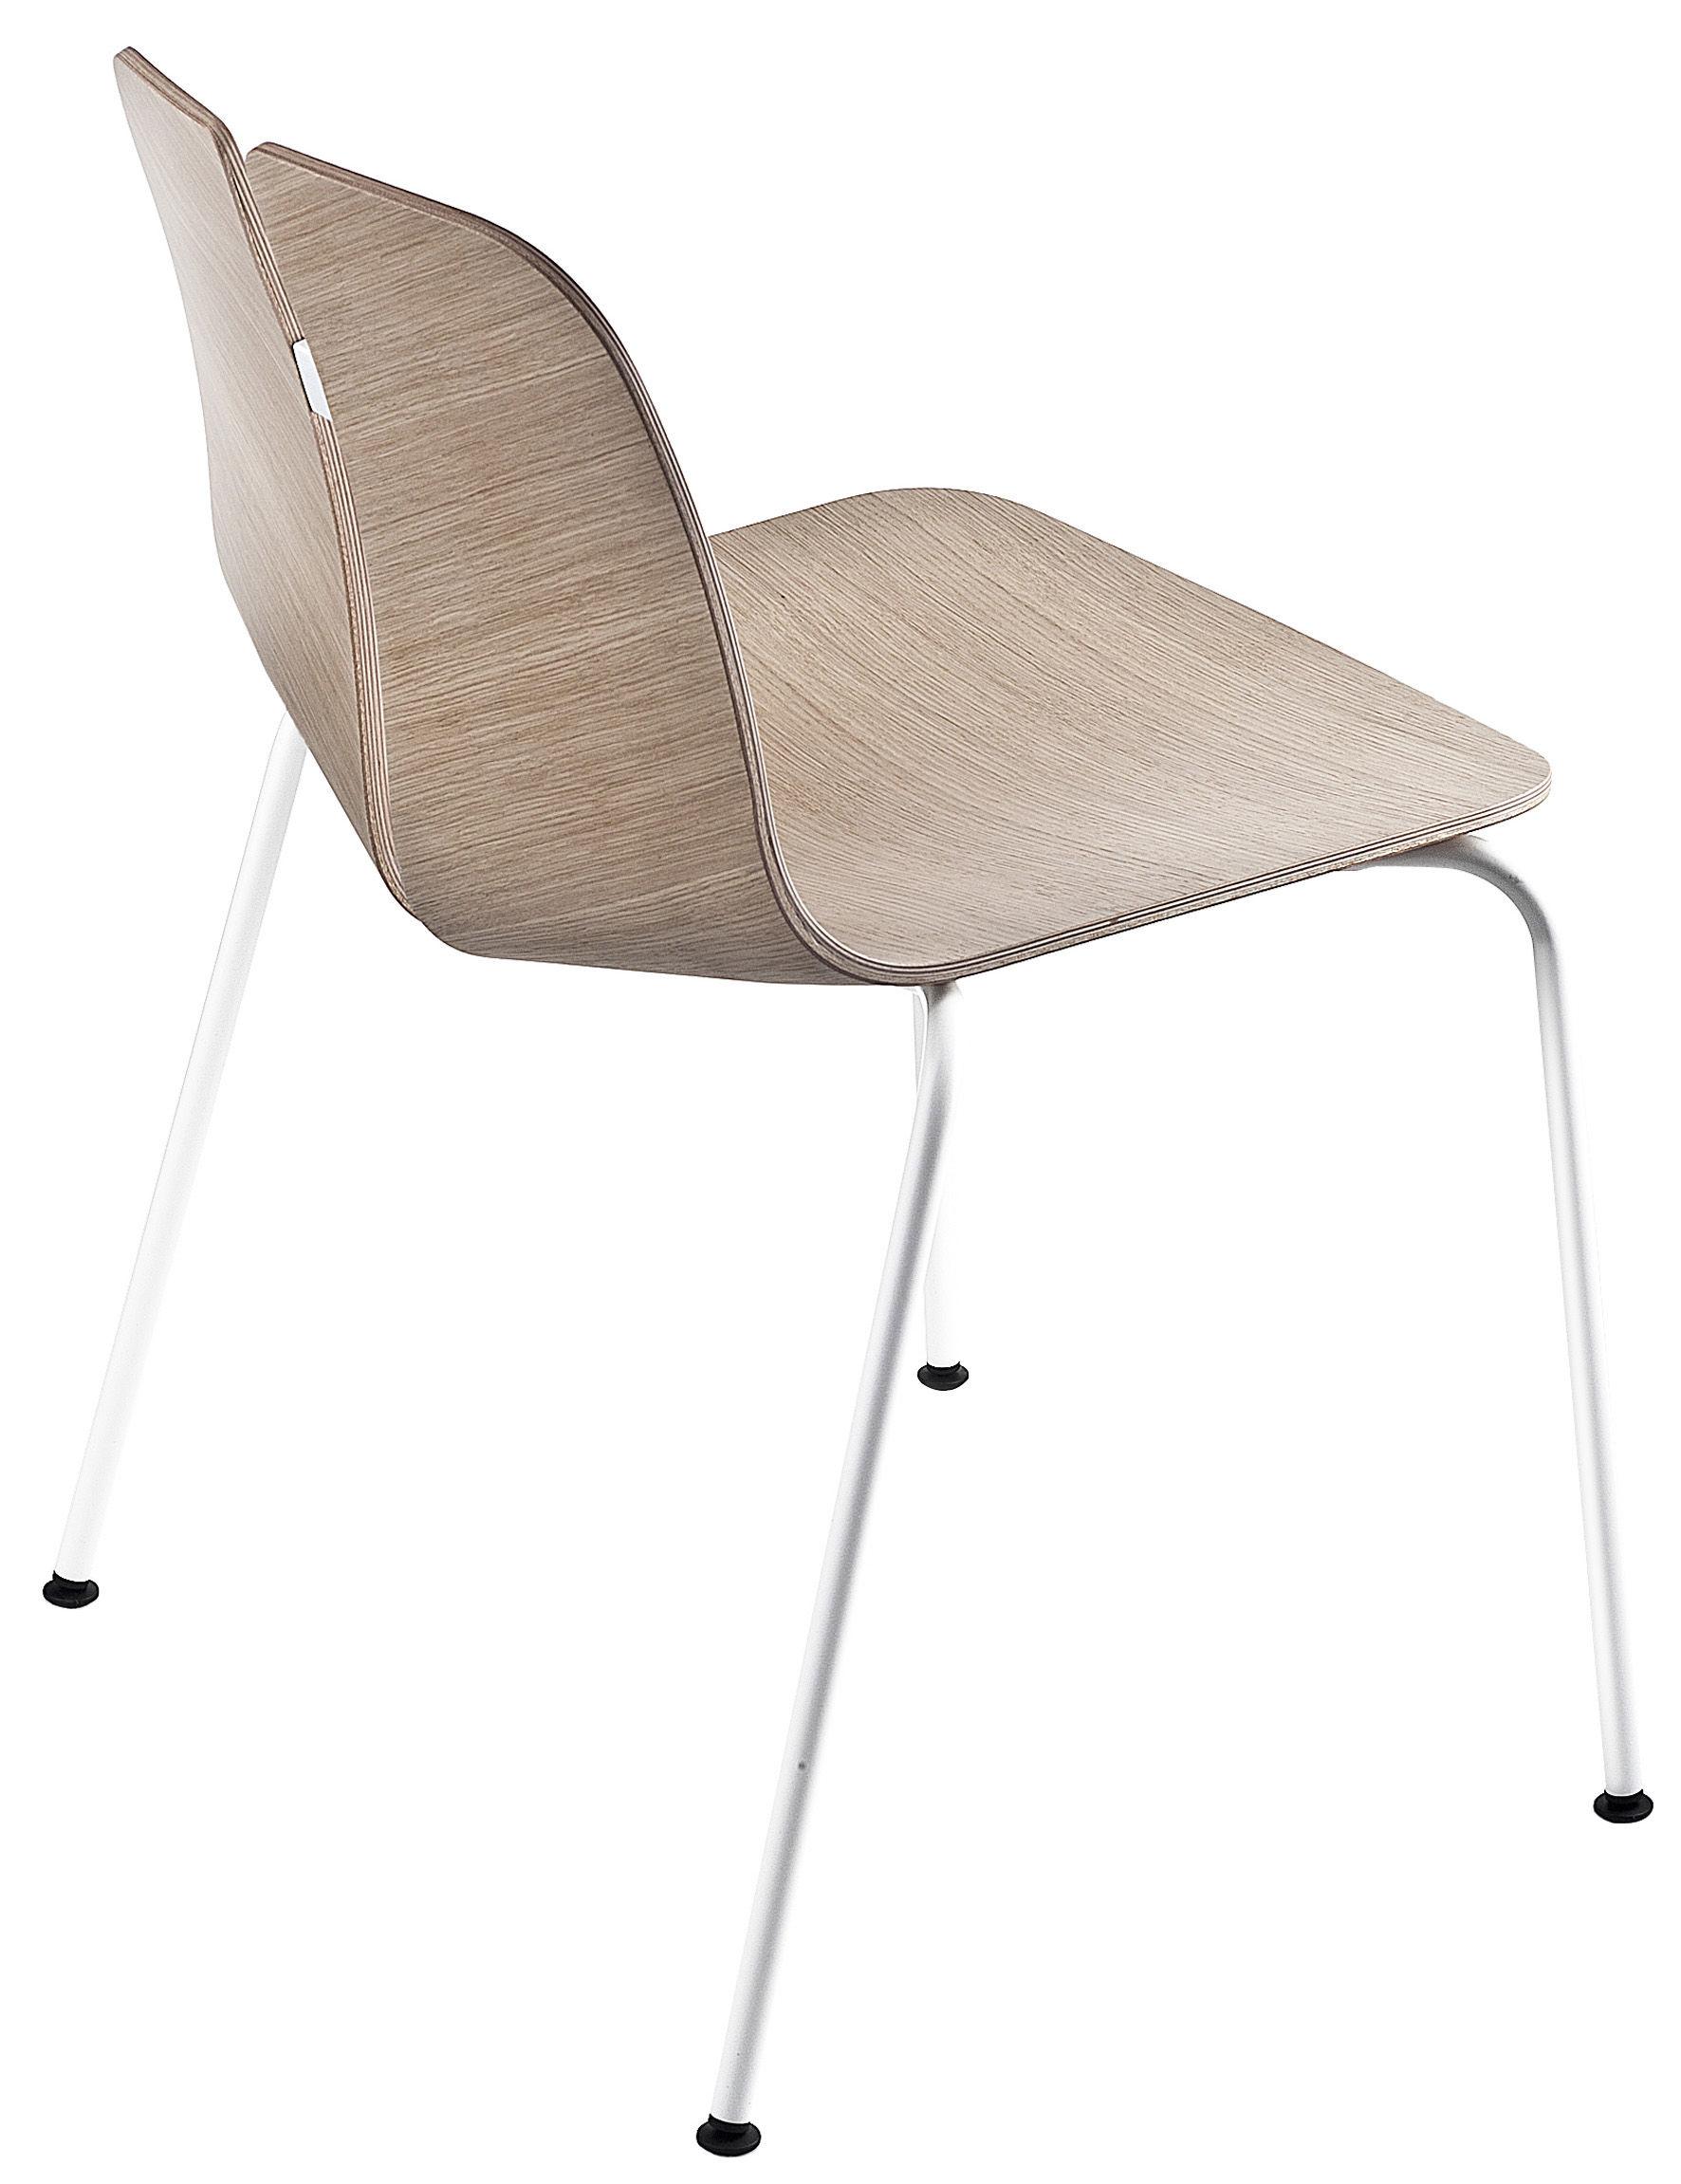 Möbel - Stühle  - Link Stapelbarer Stuhl / Holz - Lapalma - Eiche gebleicht / Fußgestell weiß lackiert - Laminé de bois plaqué, rostfreier lackierter Stahl